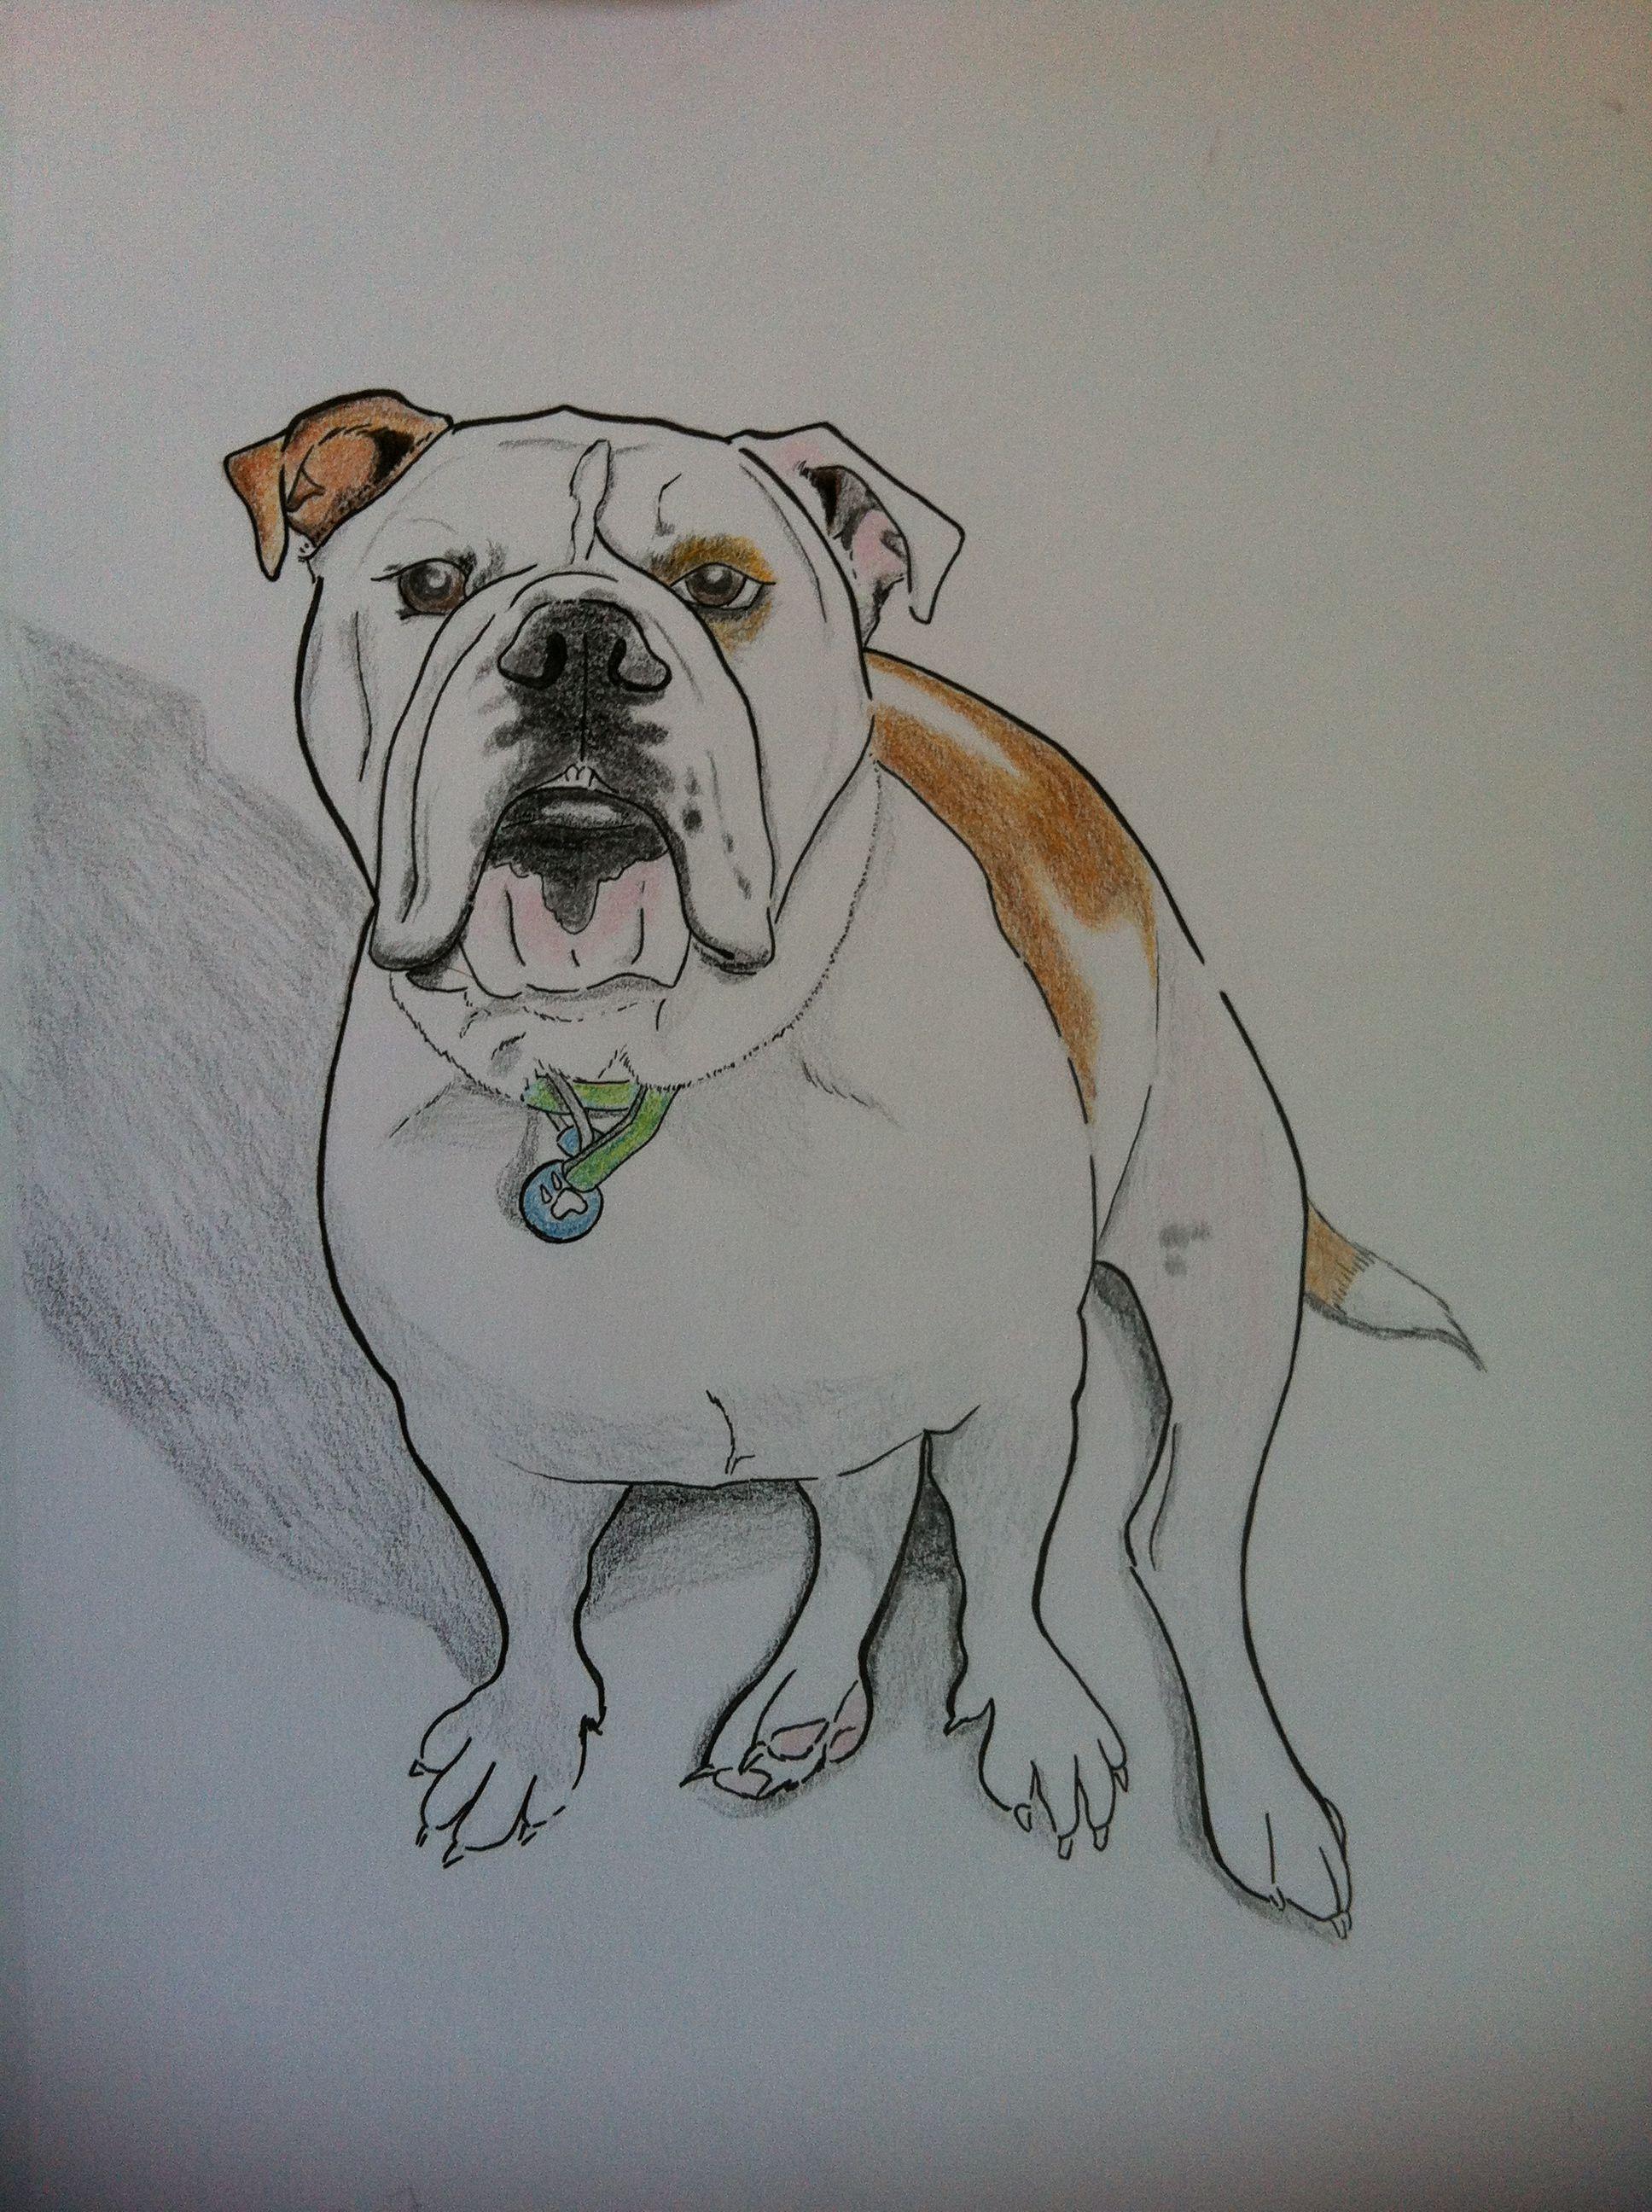 Another custom bulldog portrait I drew. His name is Rolls